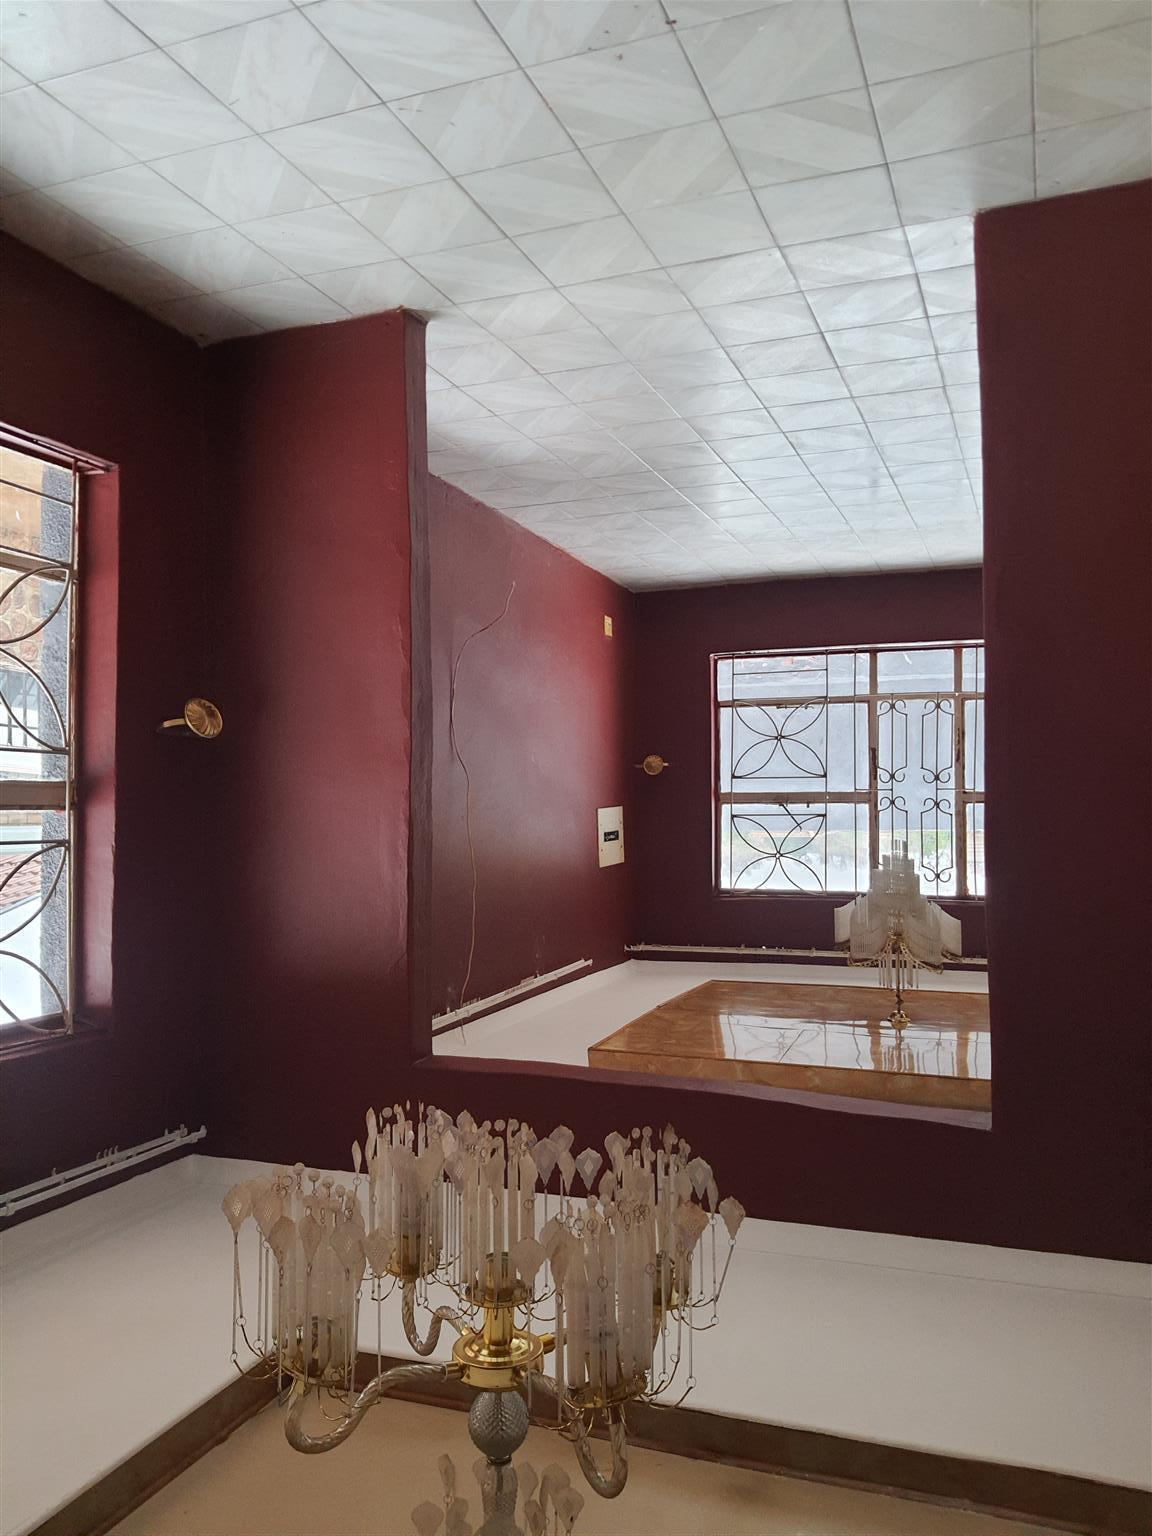 House to rent in soshanguve m